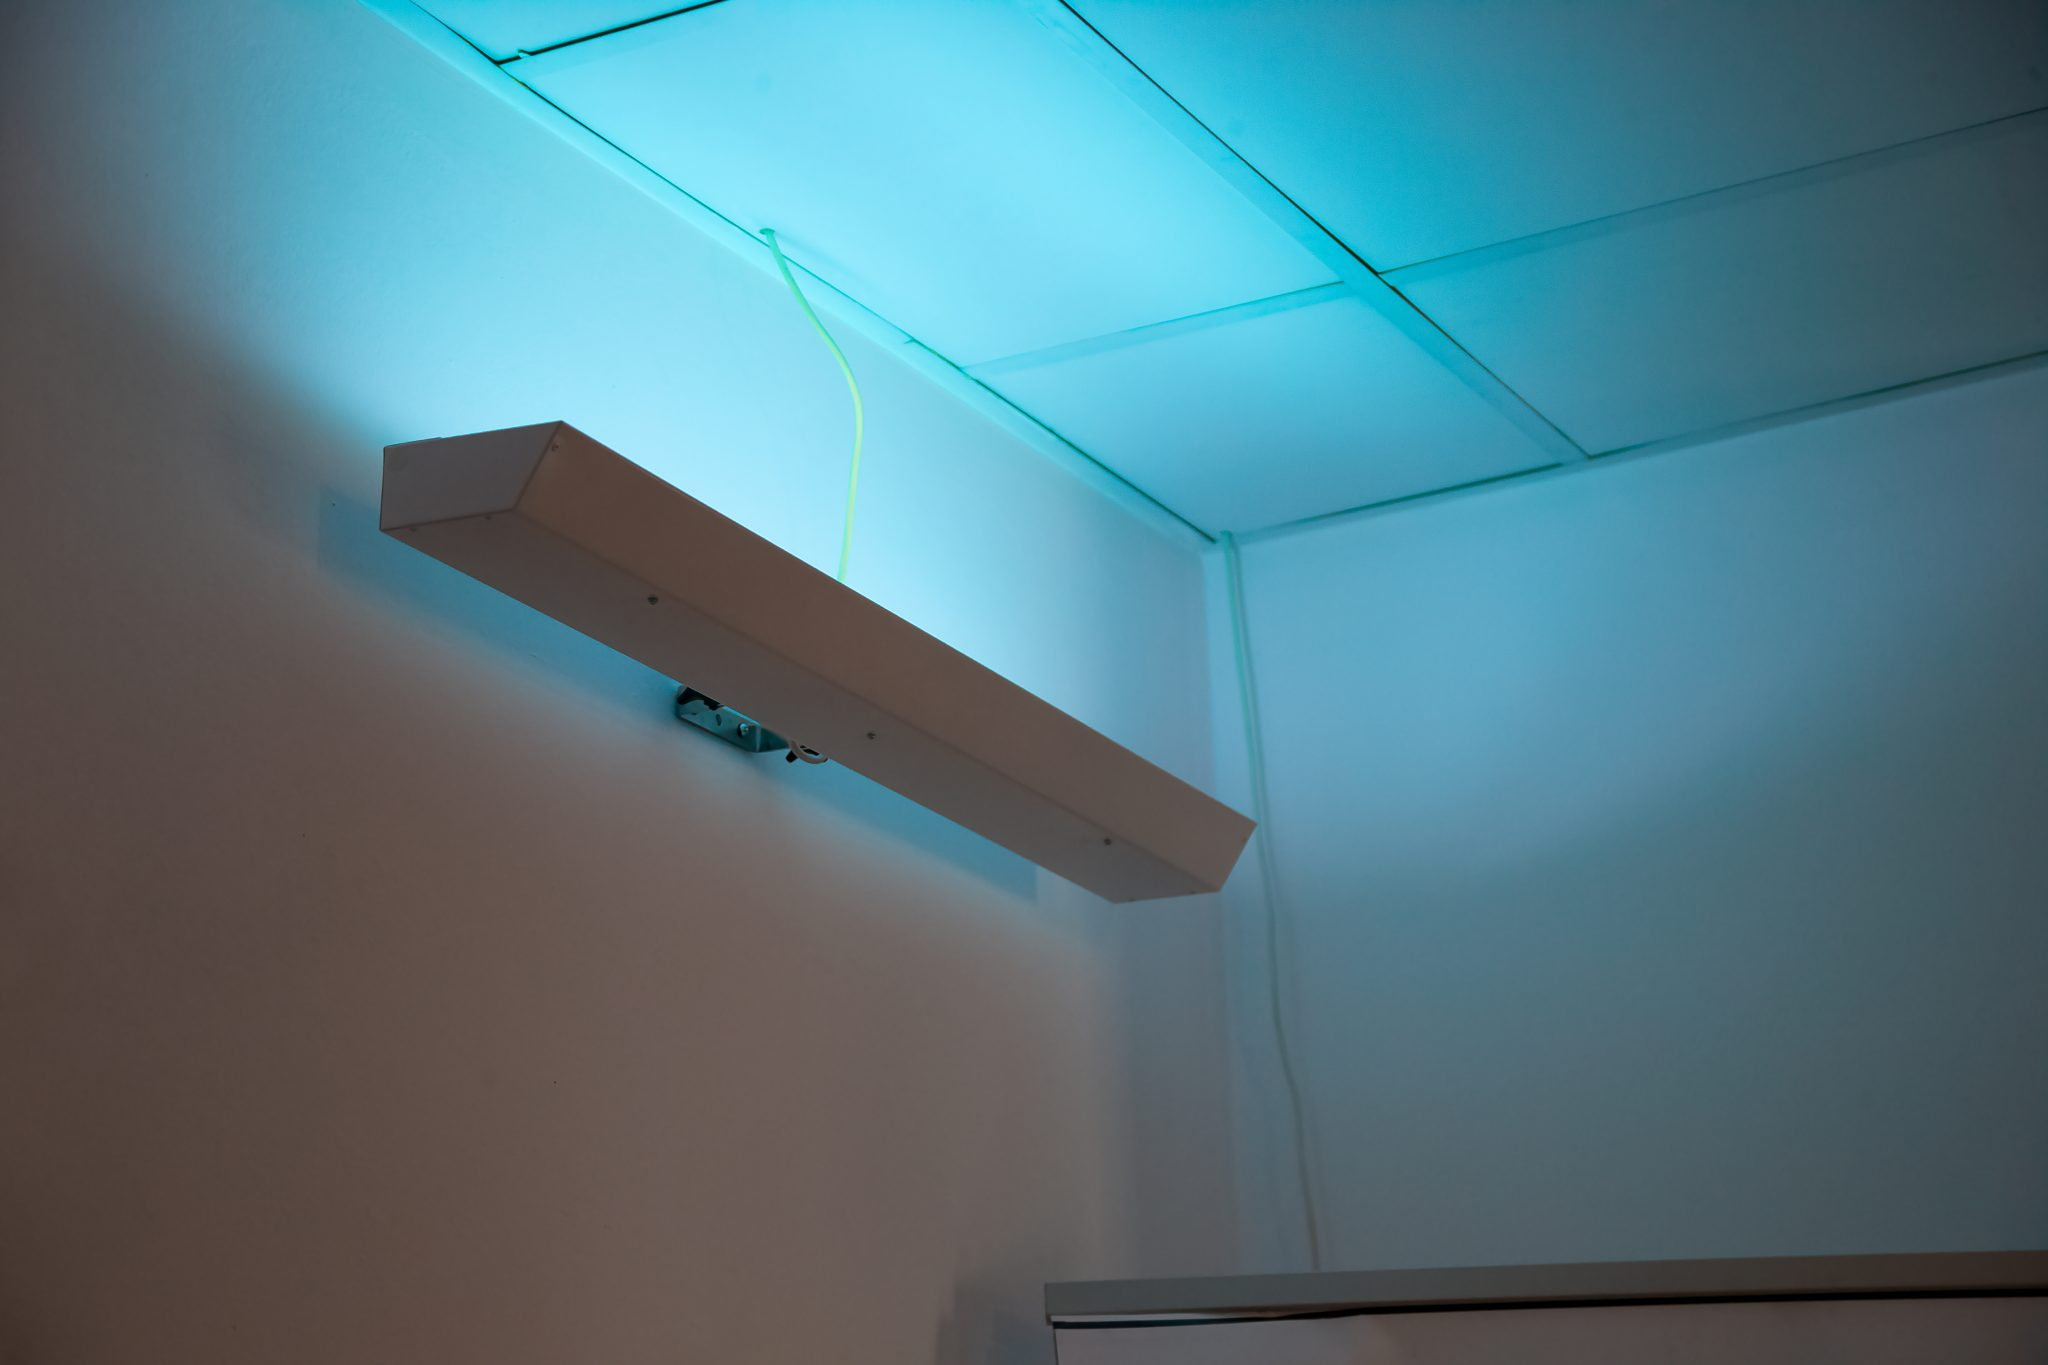 lampa 2 hol